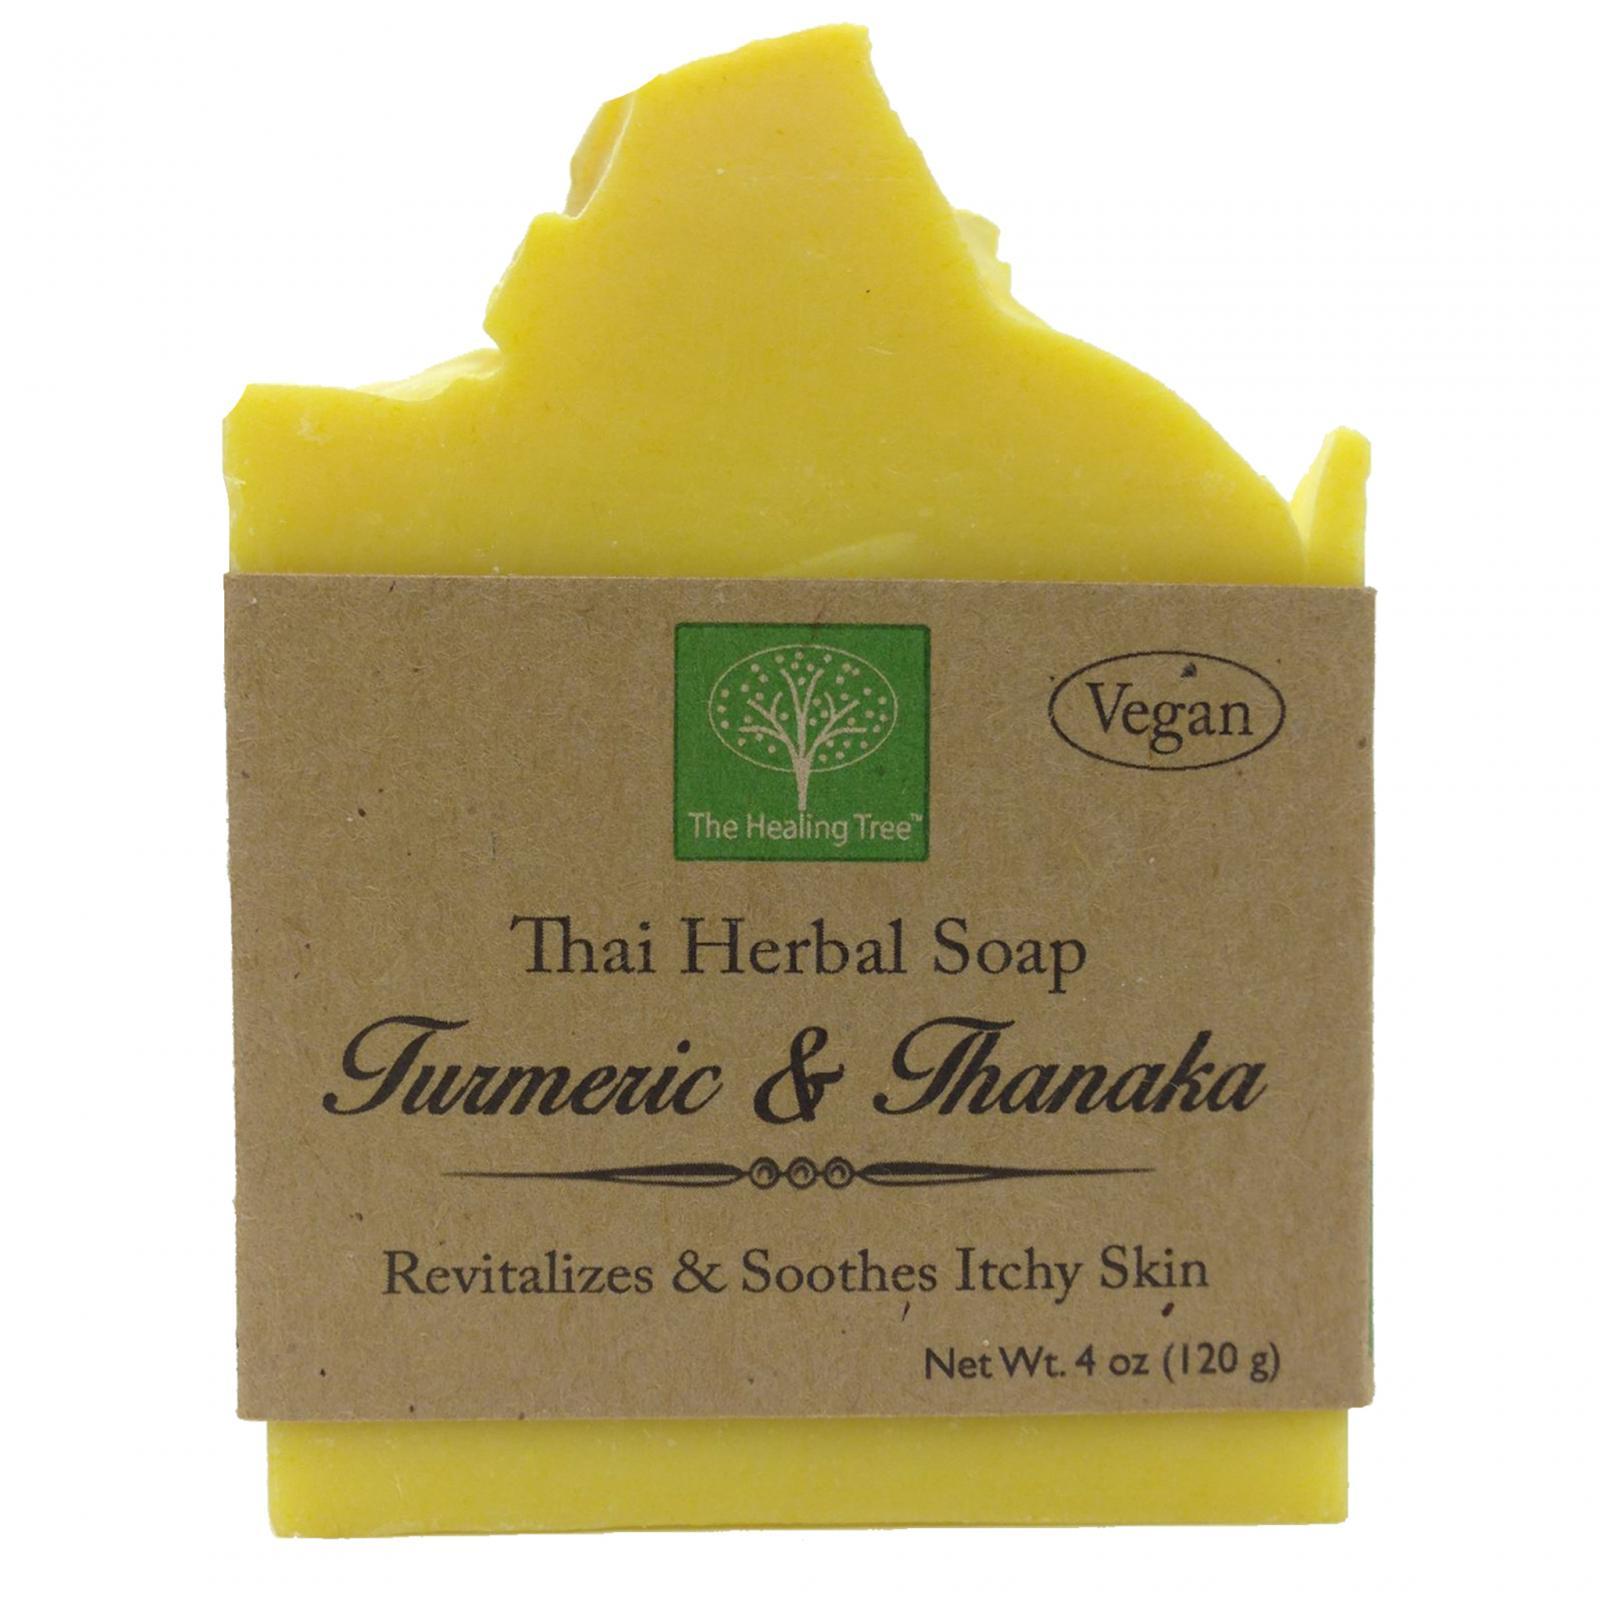 Turmeric & Thanaka Handmade Soap helps Soothe Itchy Skin